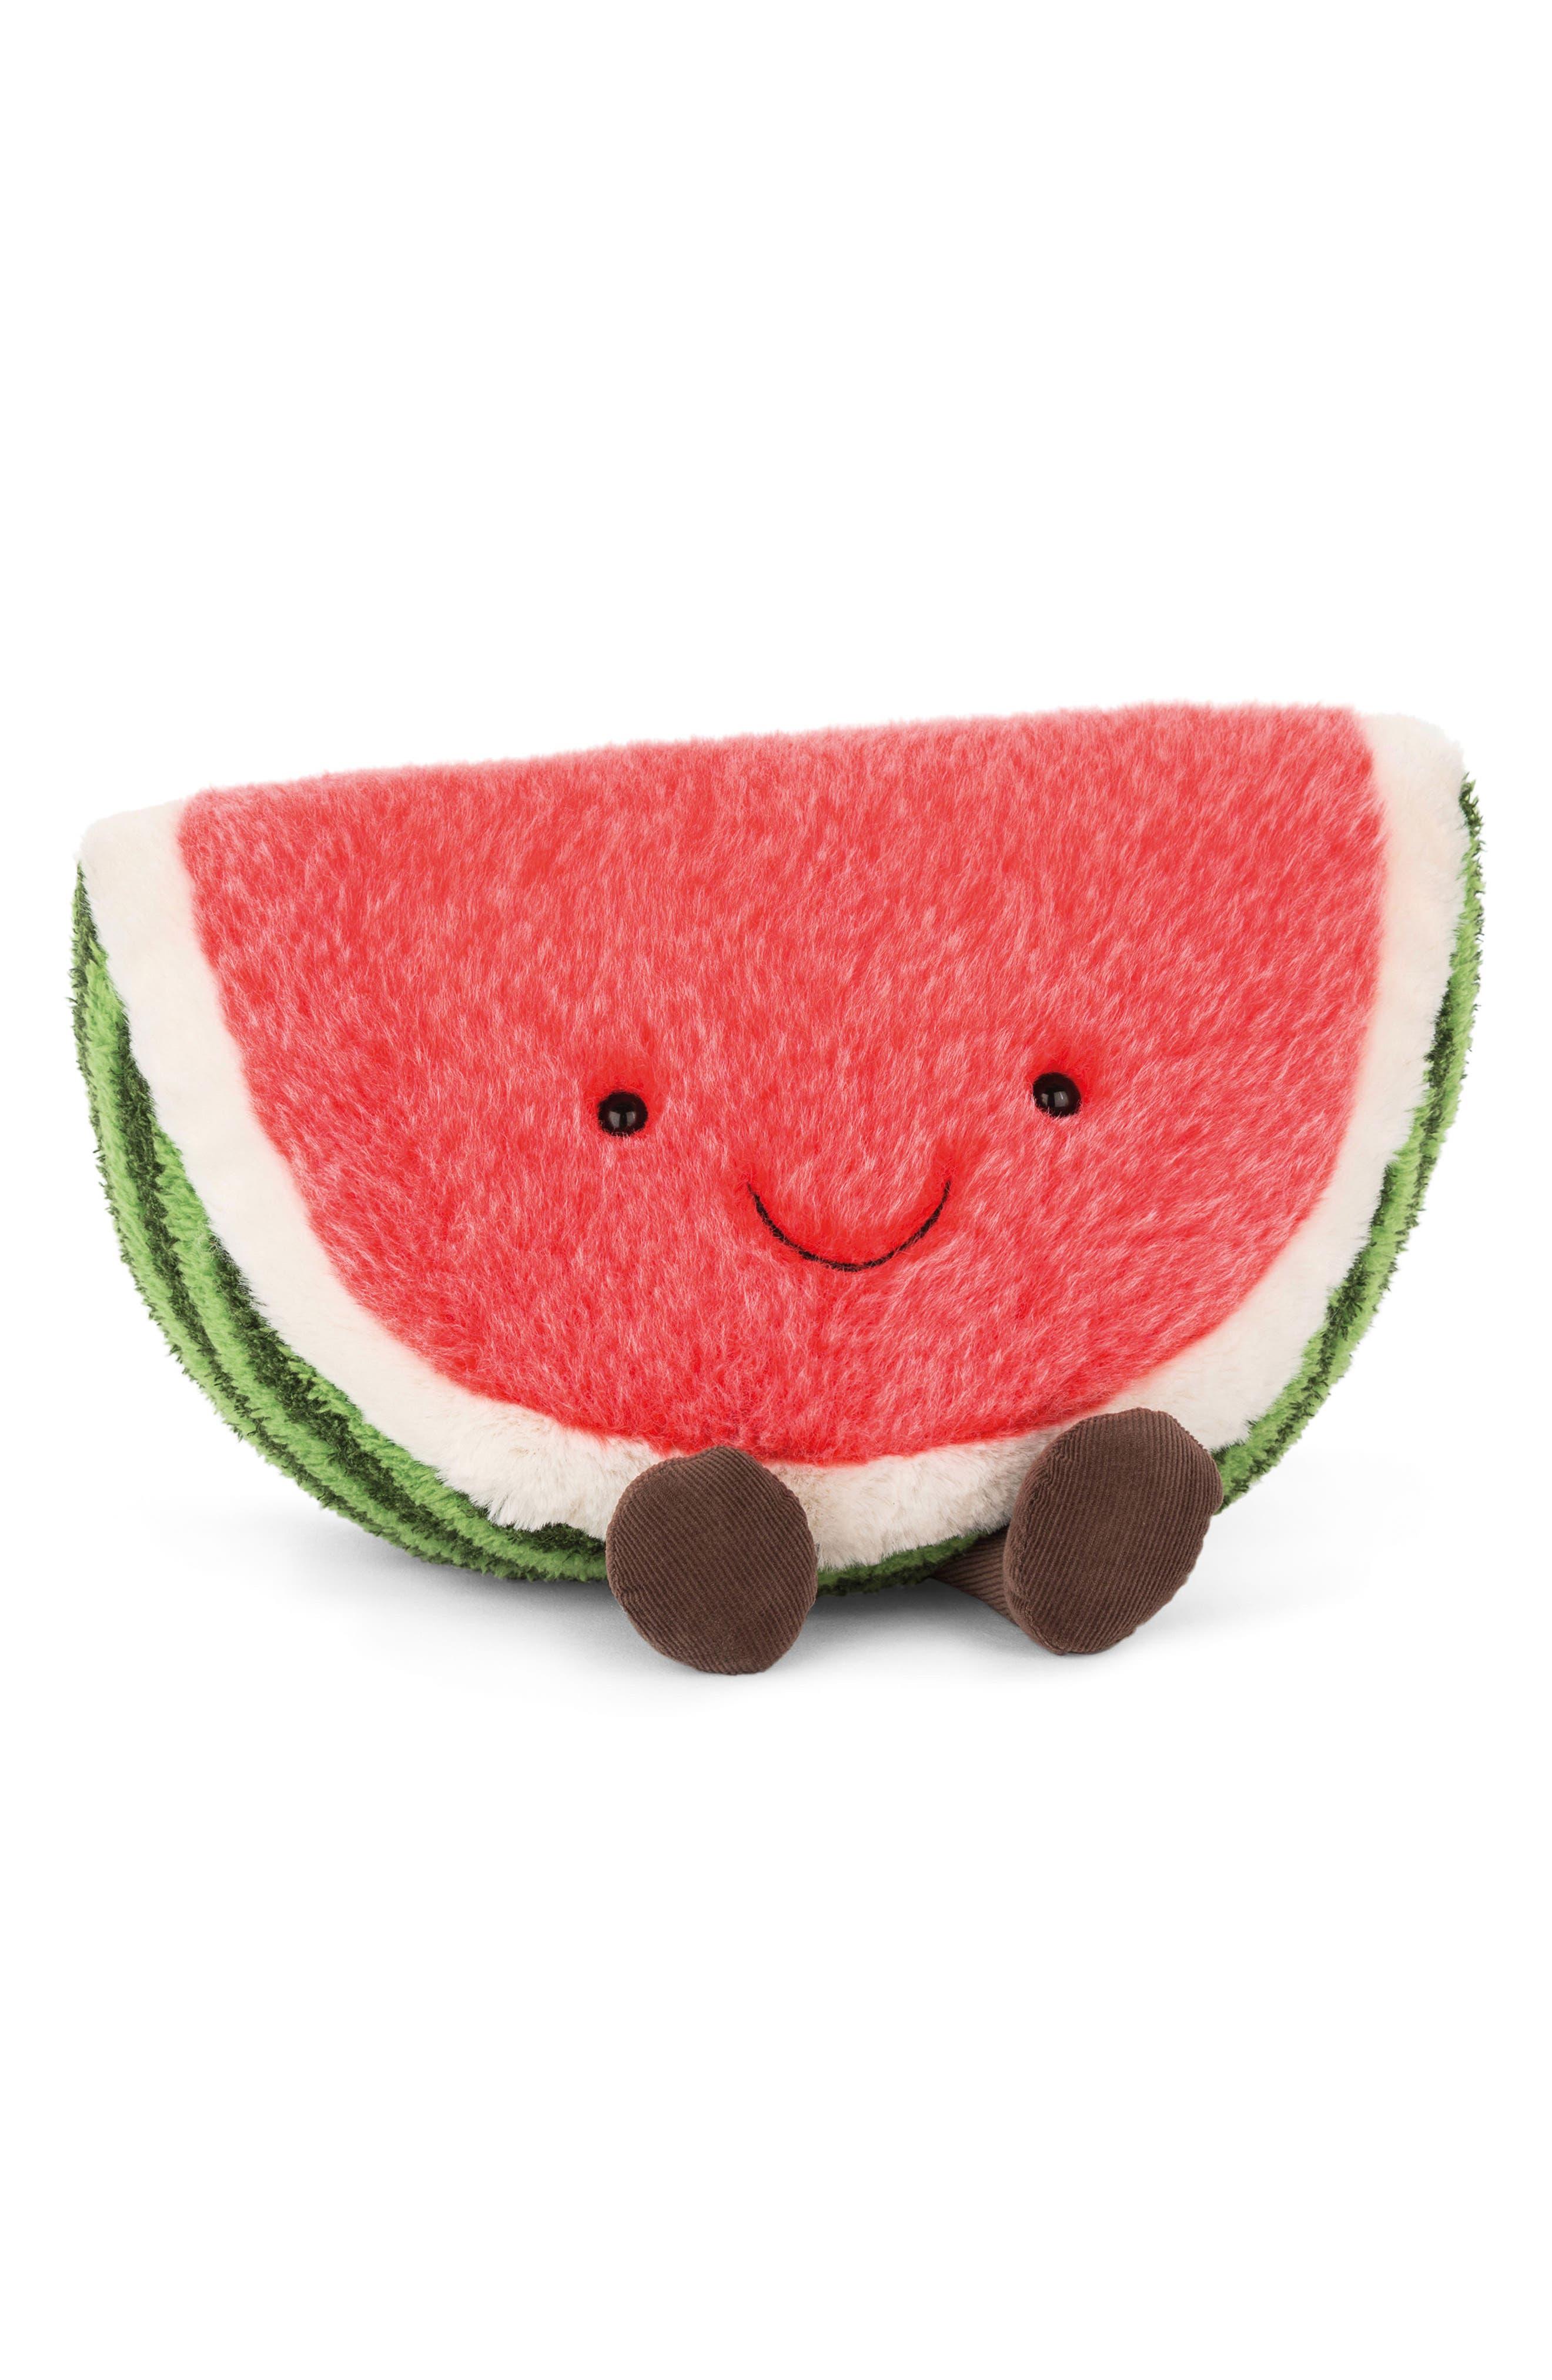 Amuseable Watermelon Plush Toy,                             Main thumbnail 1, color,                             600